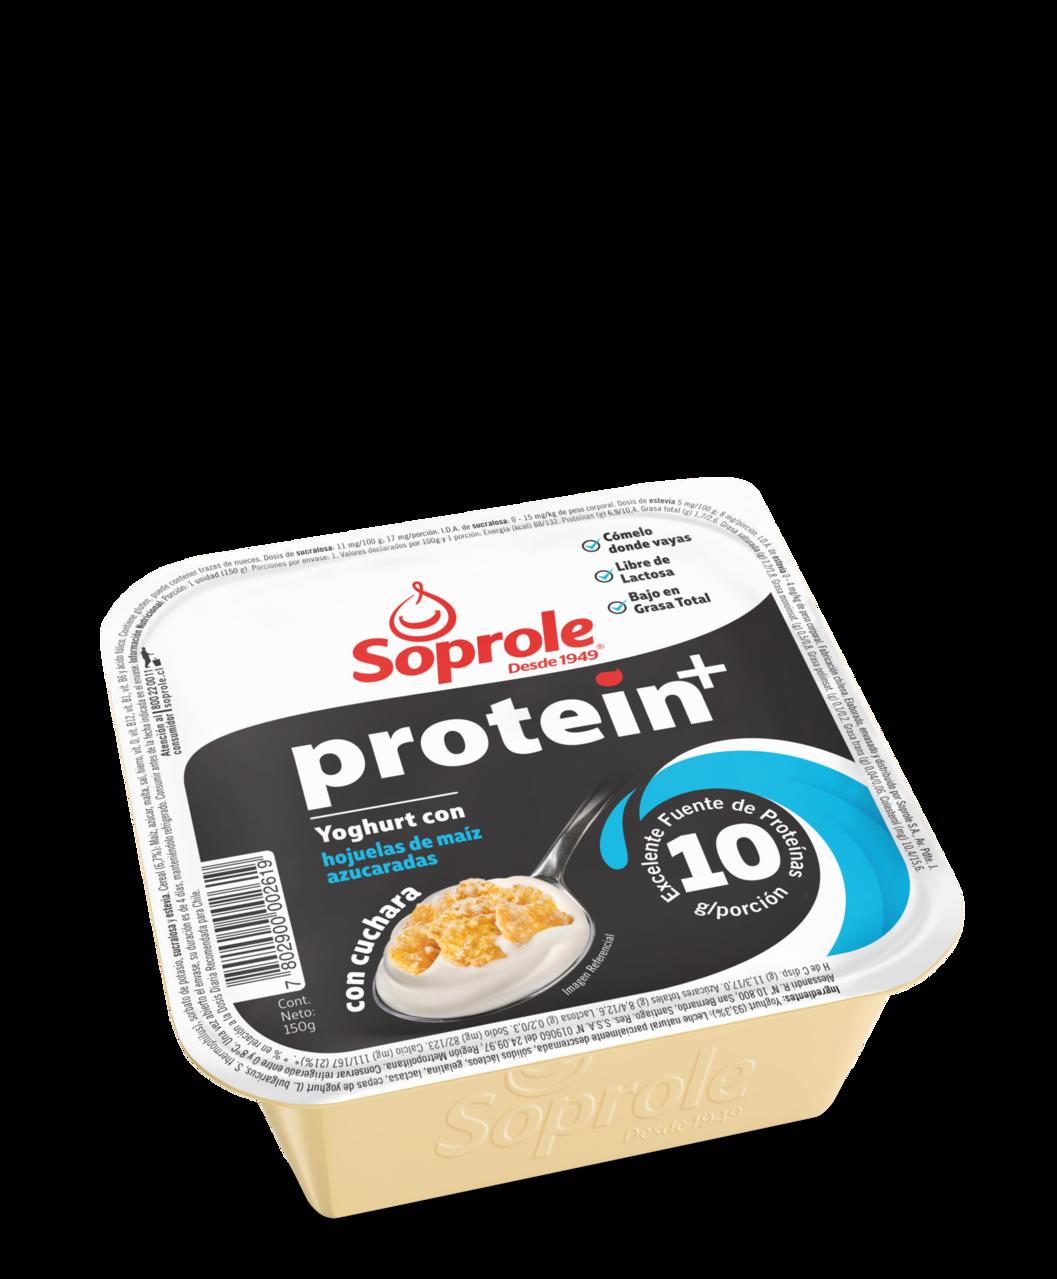 Soprole Yoghurt Portein+ con cuchara Cereal 150g